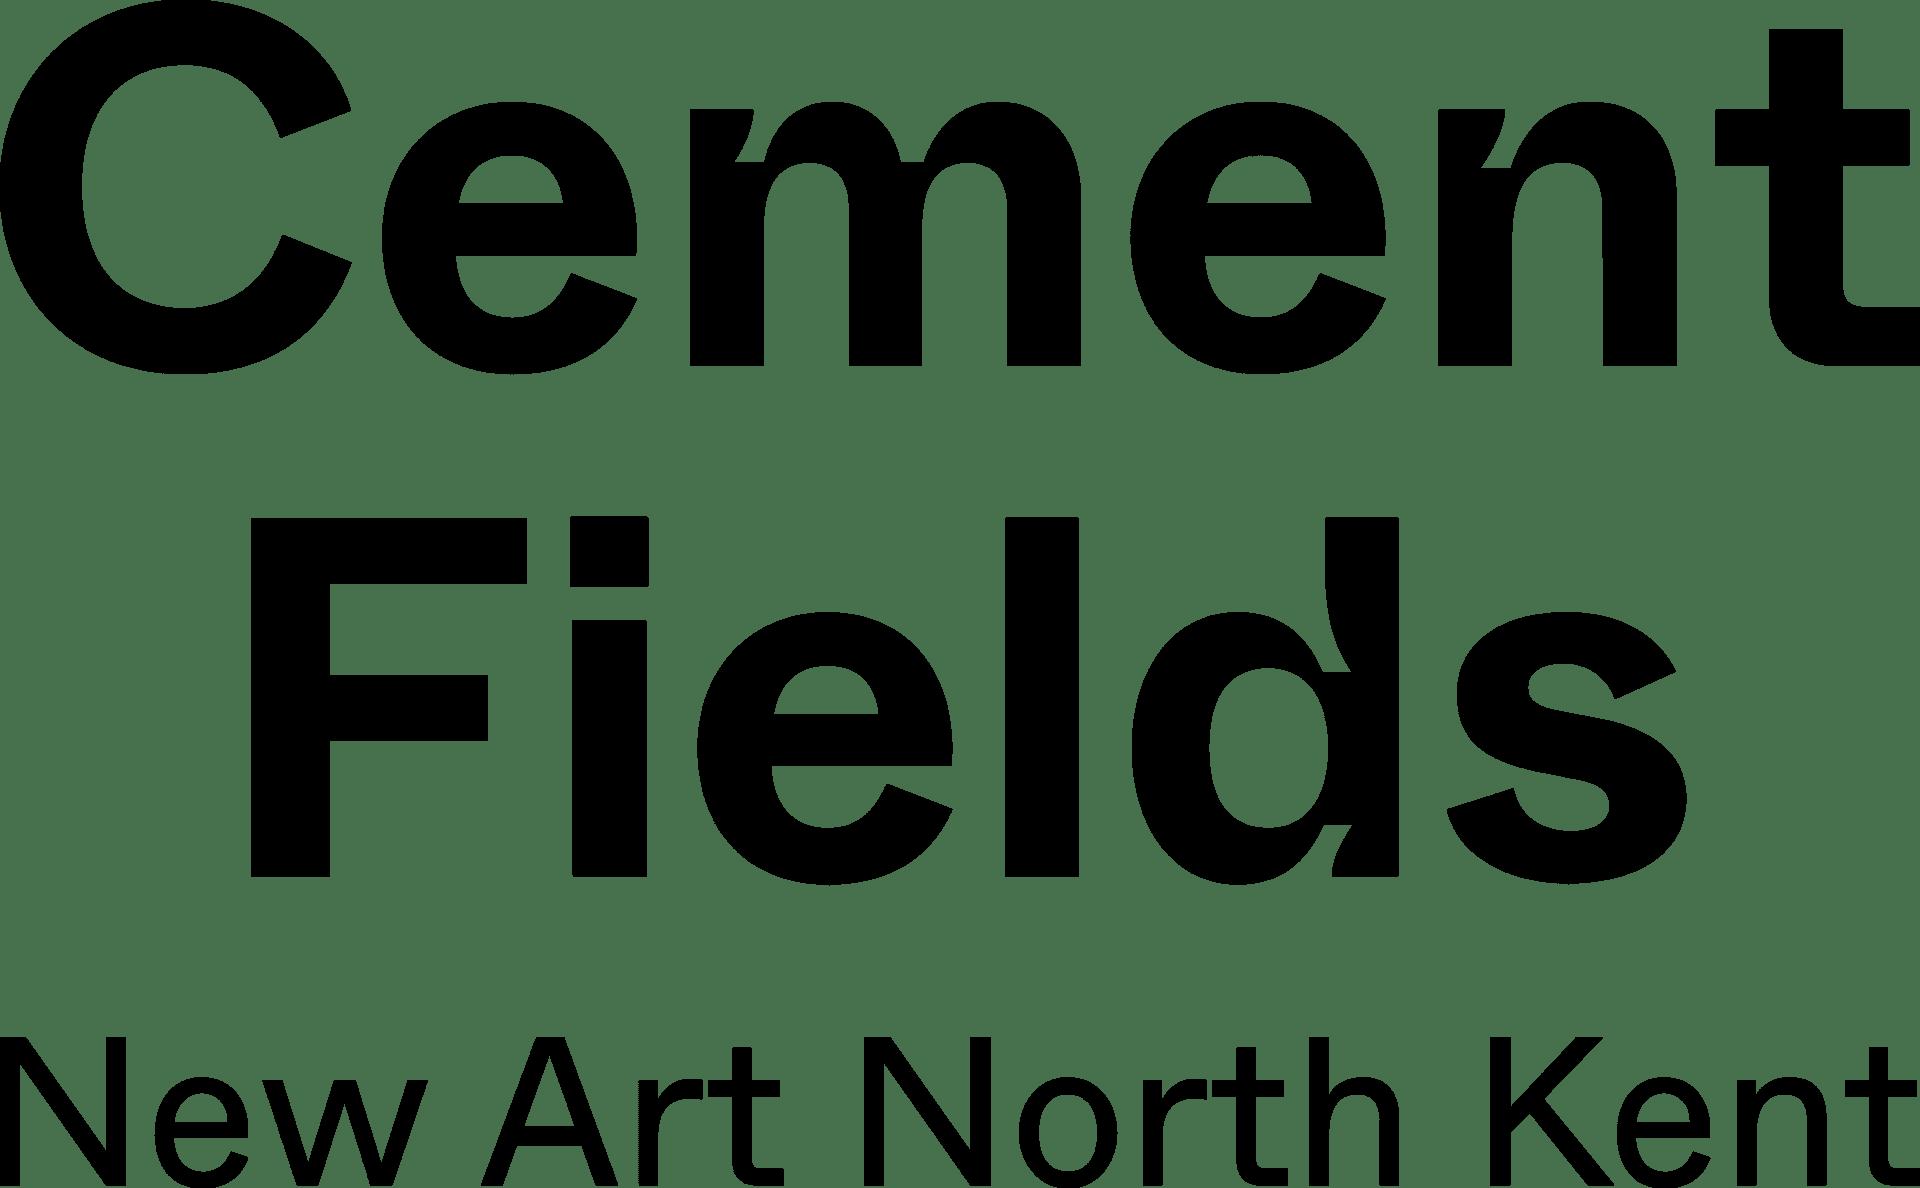 Cement Fields logo